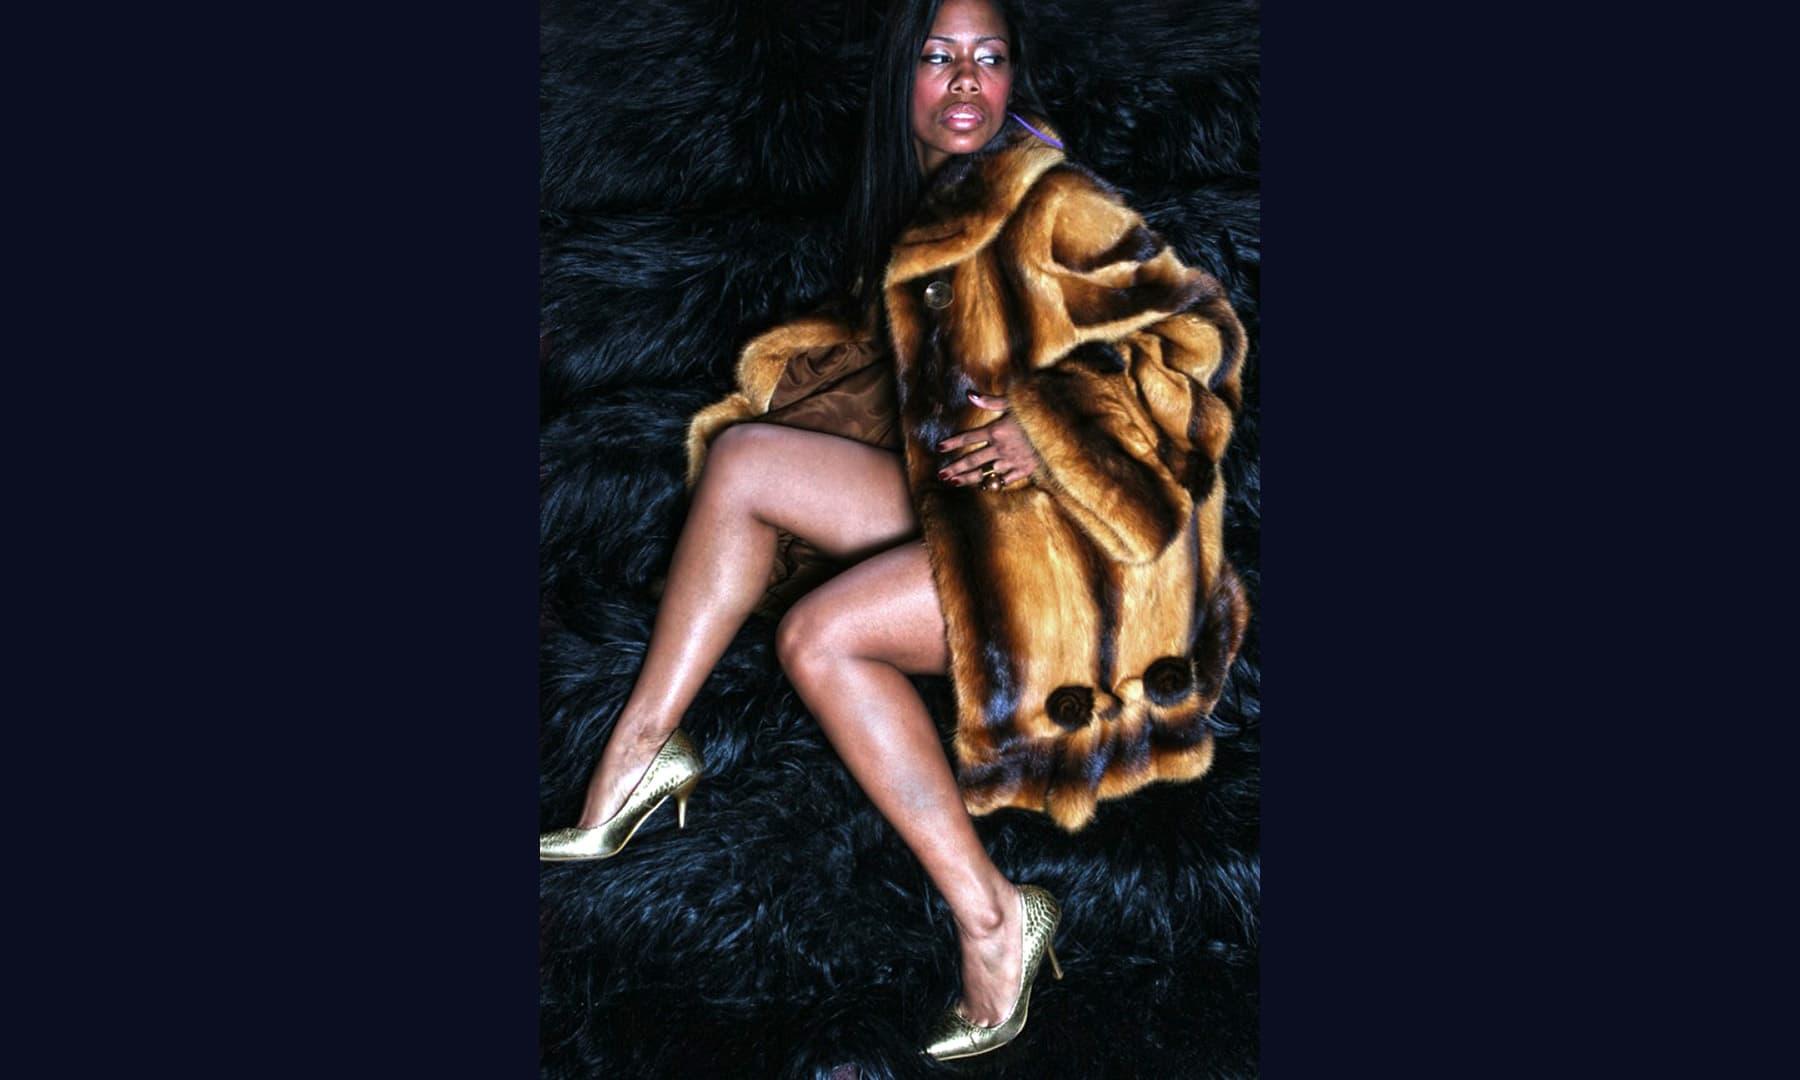 Custom designed furs